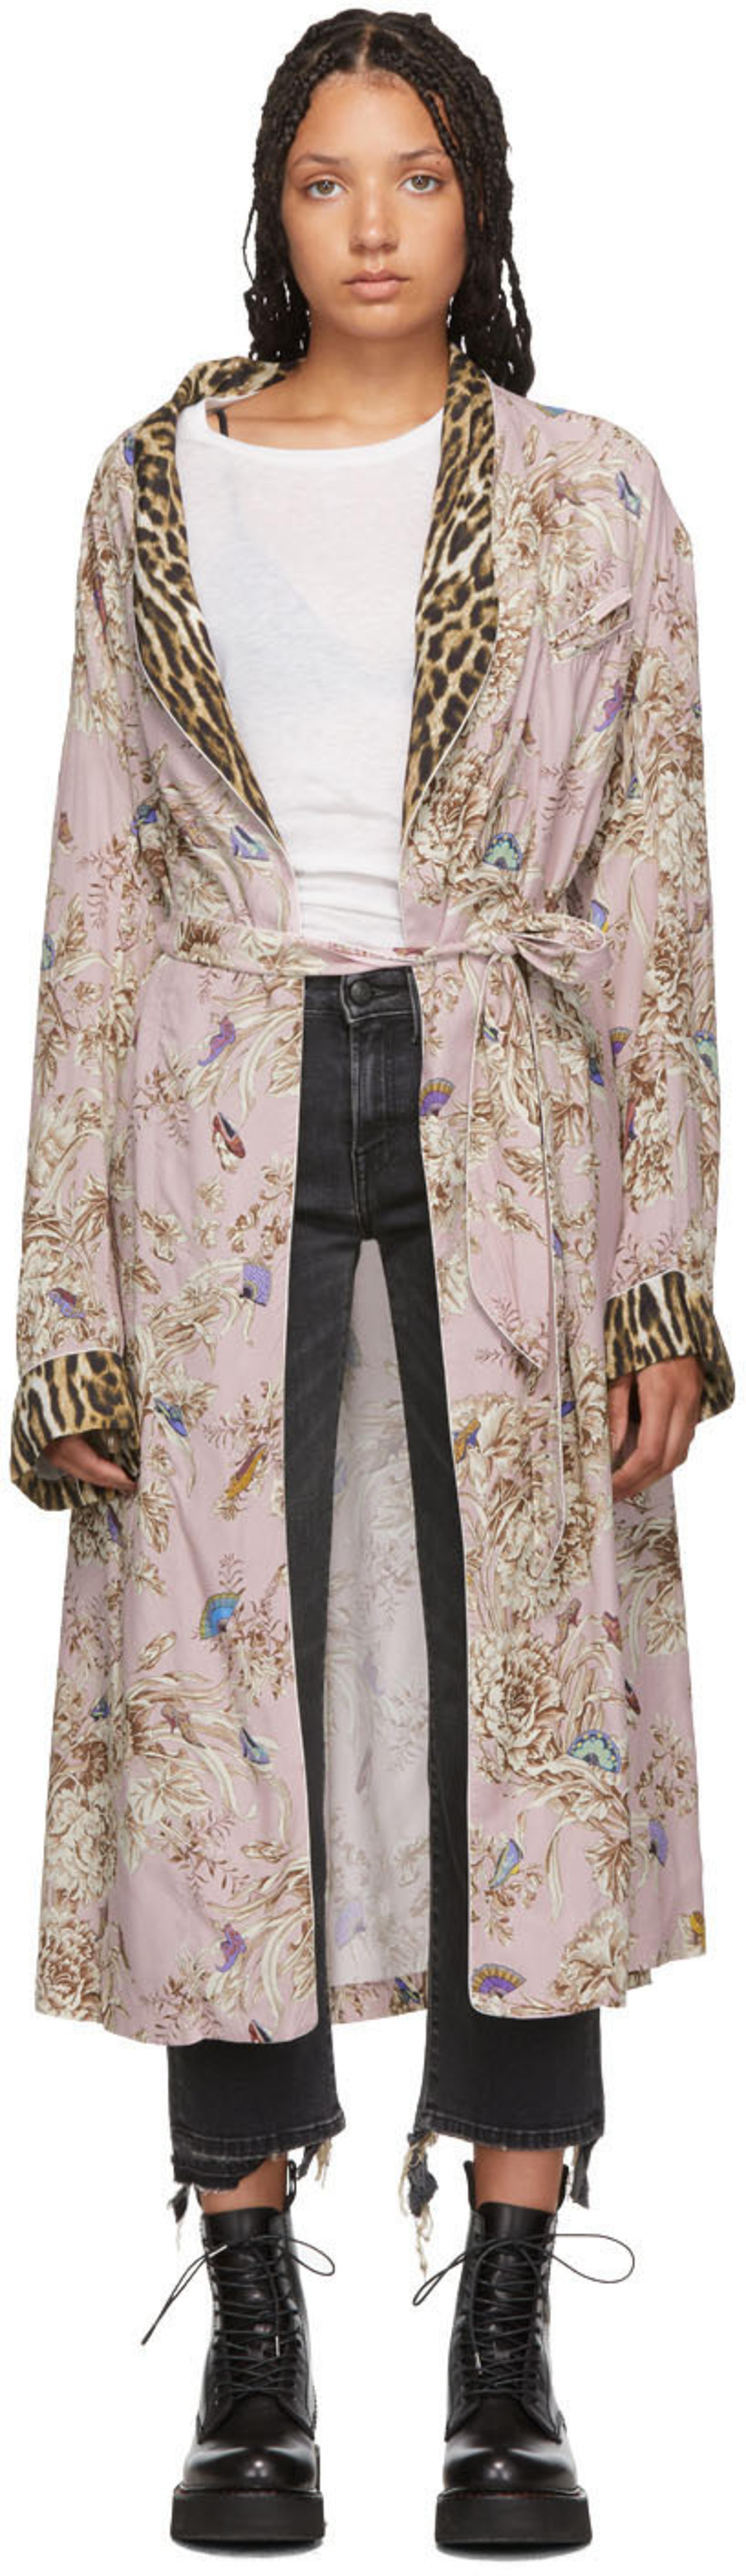 80aecaac27 Designer Clothes, Shoes & Bags for Women   SSENSE